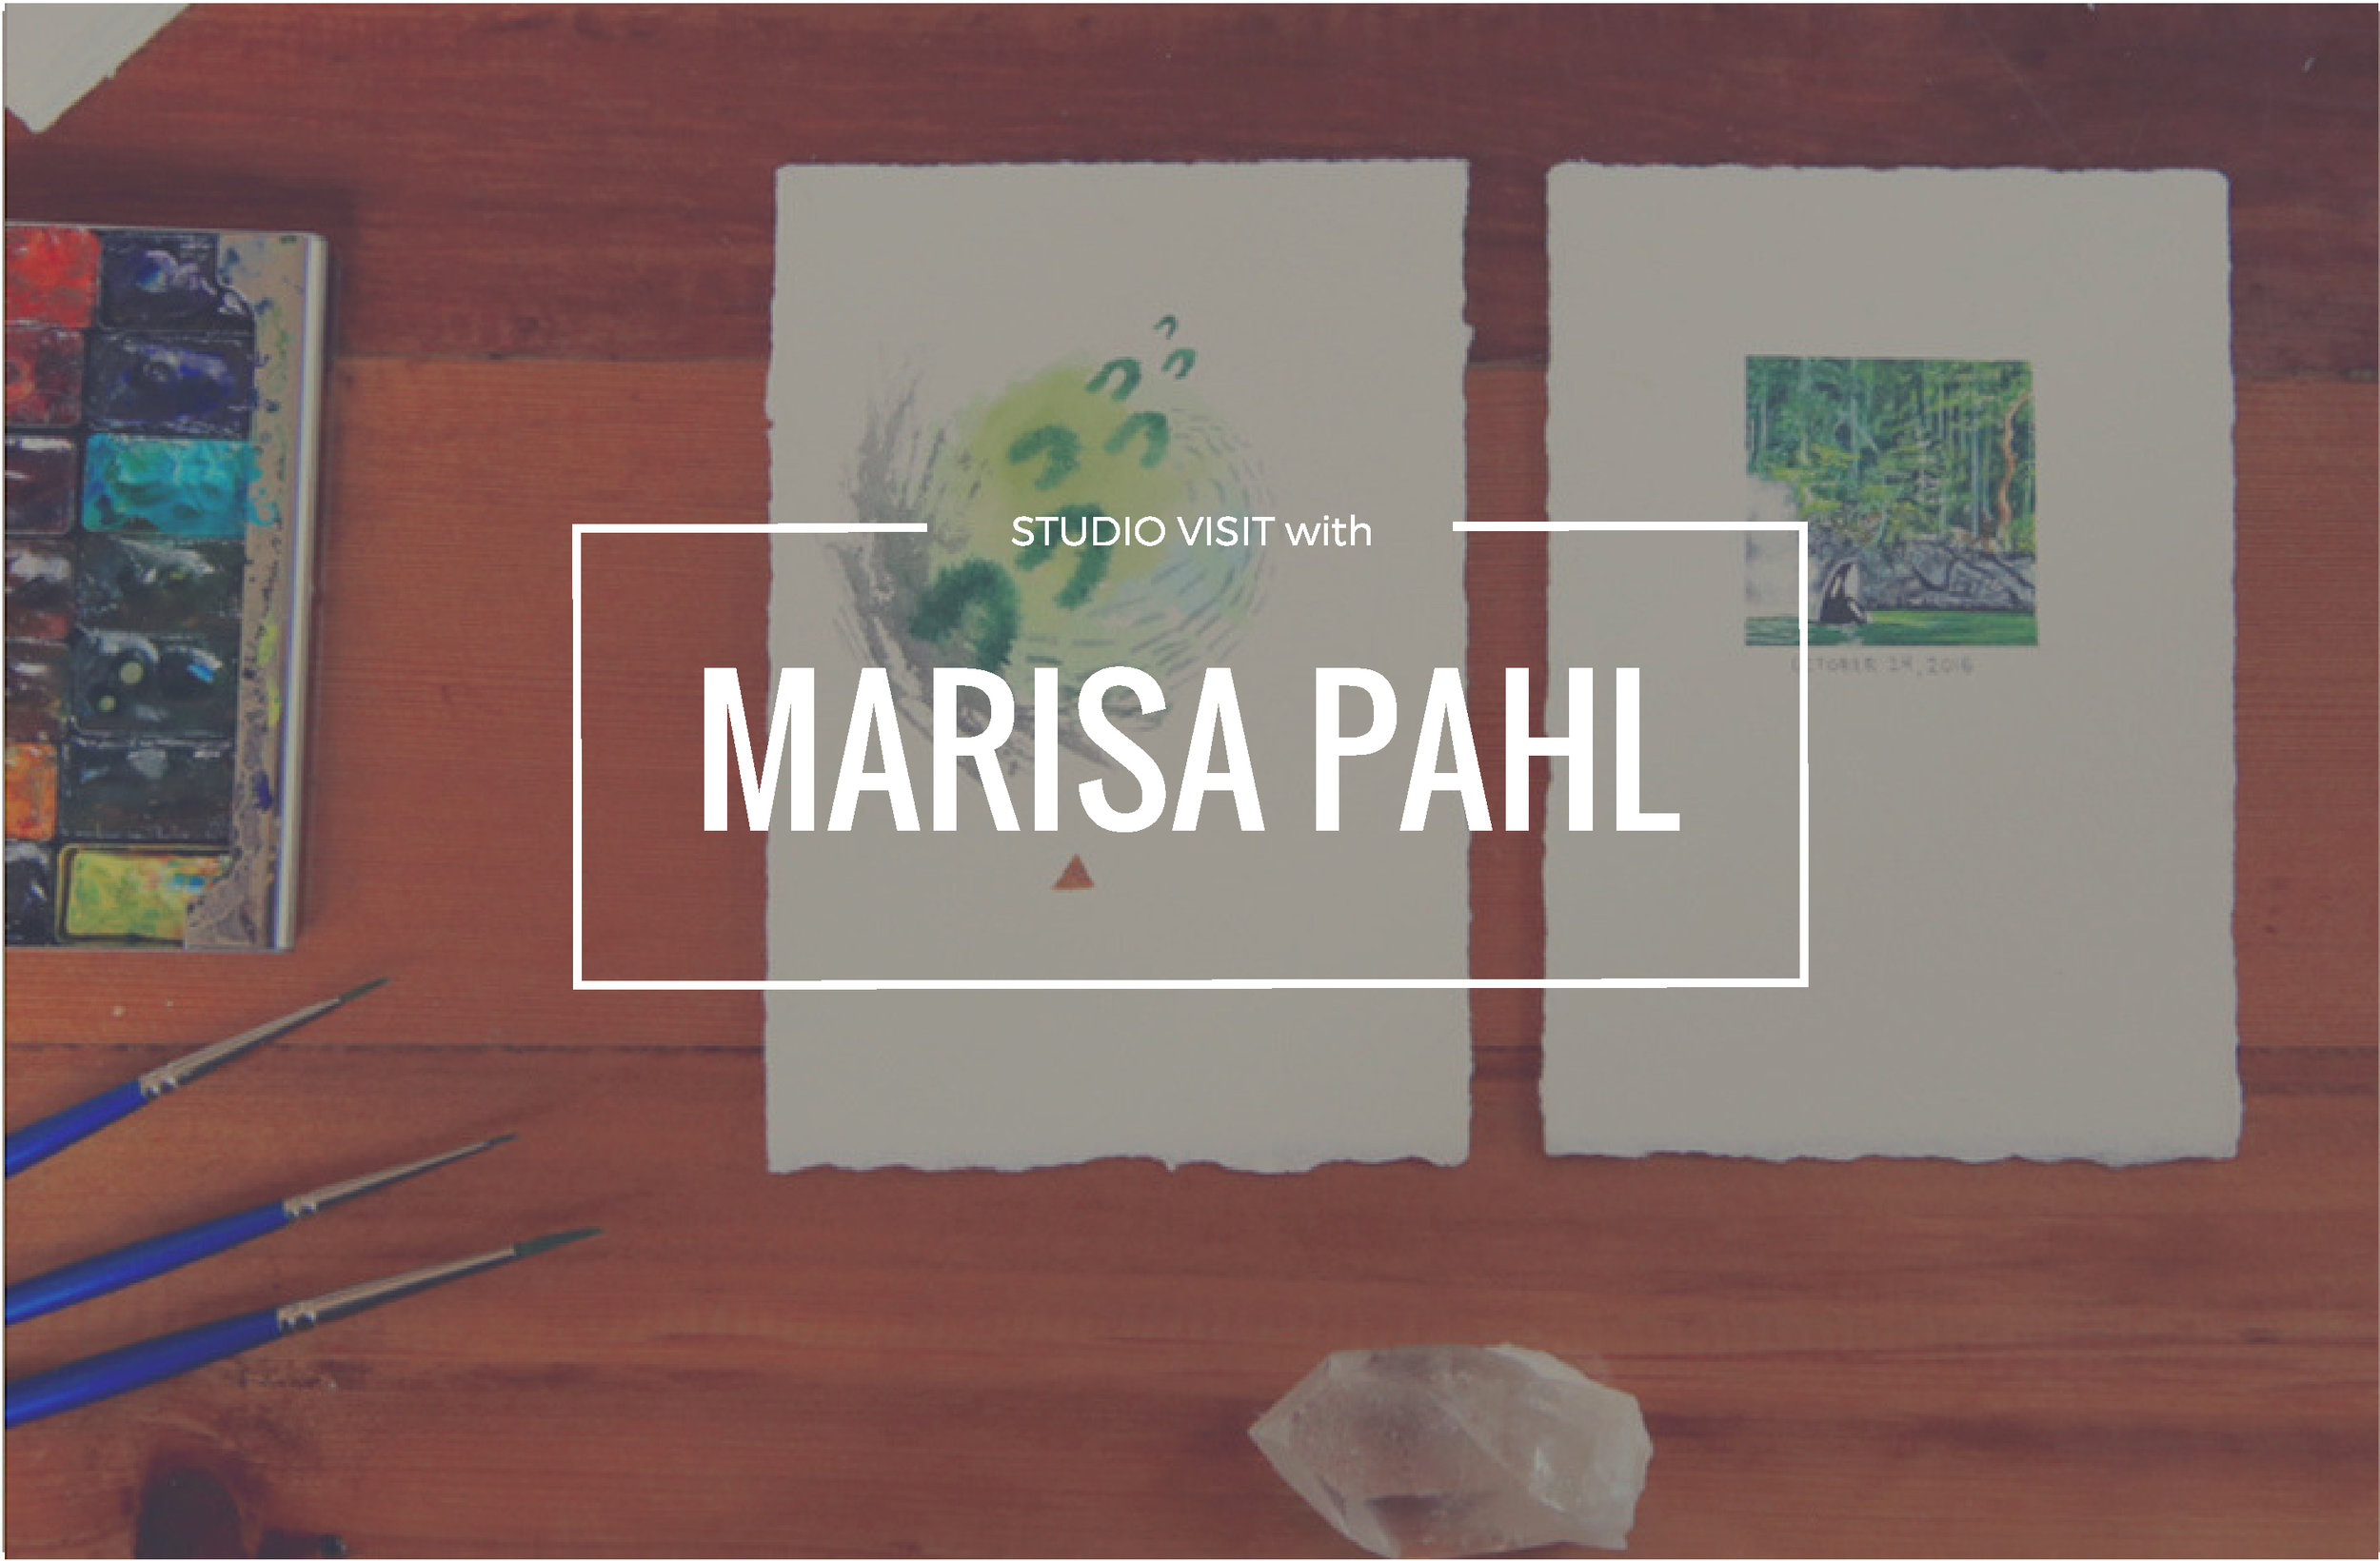 MarisaPahl_TEXT_960x640.jpg